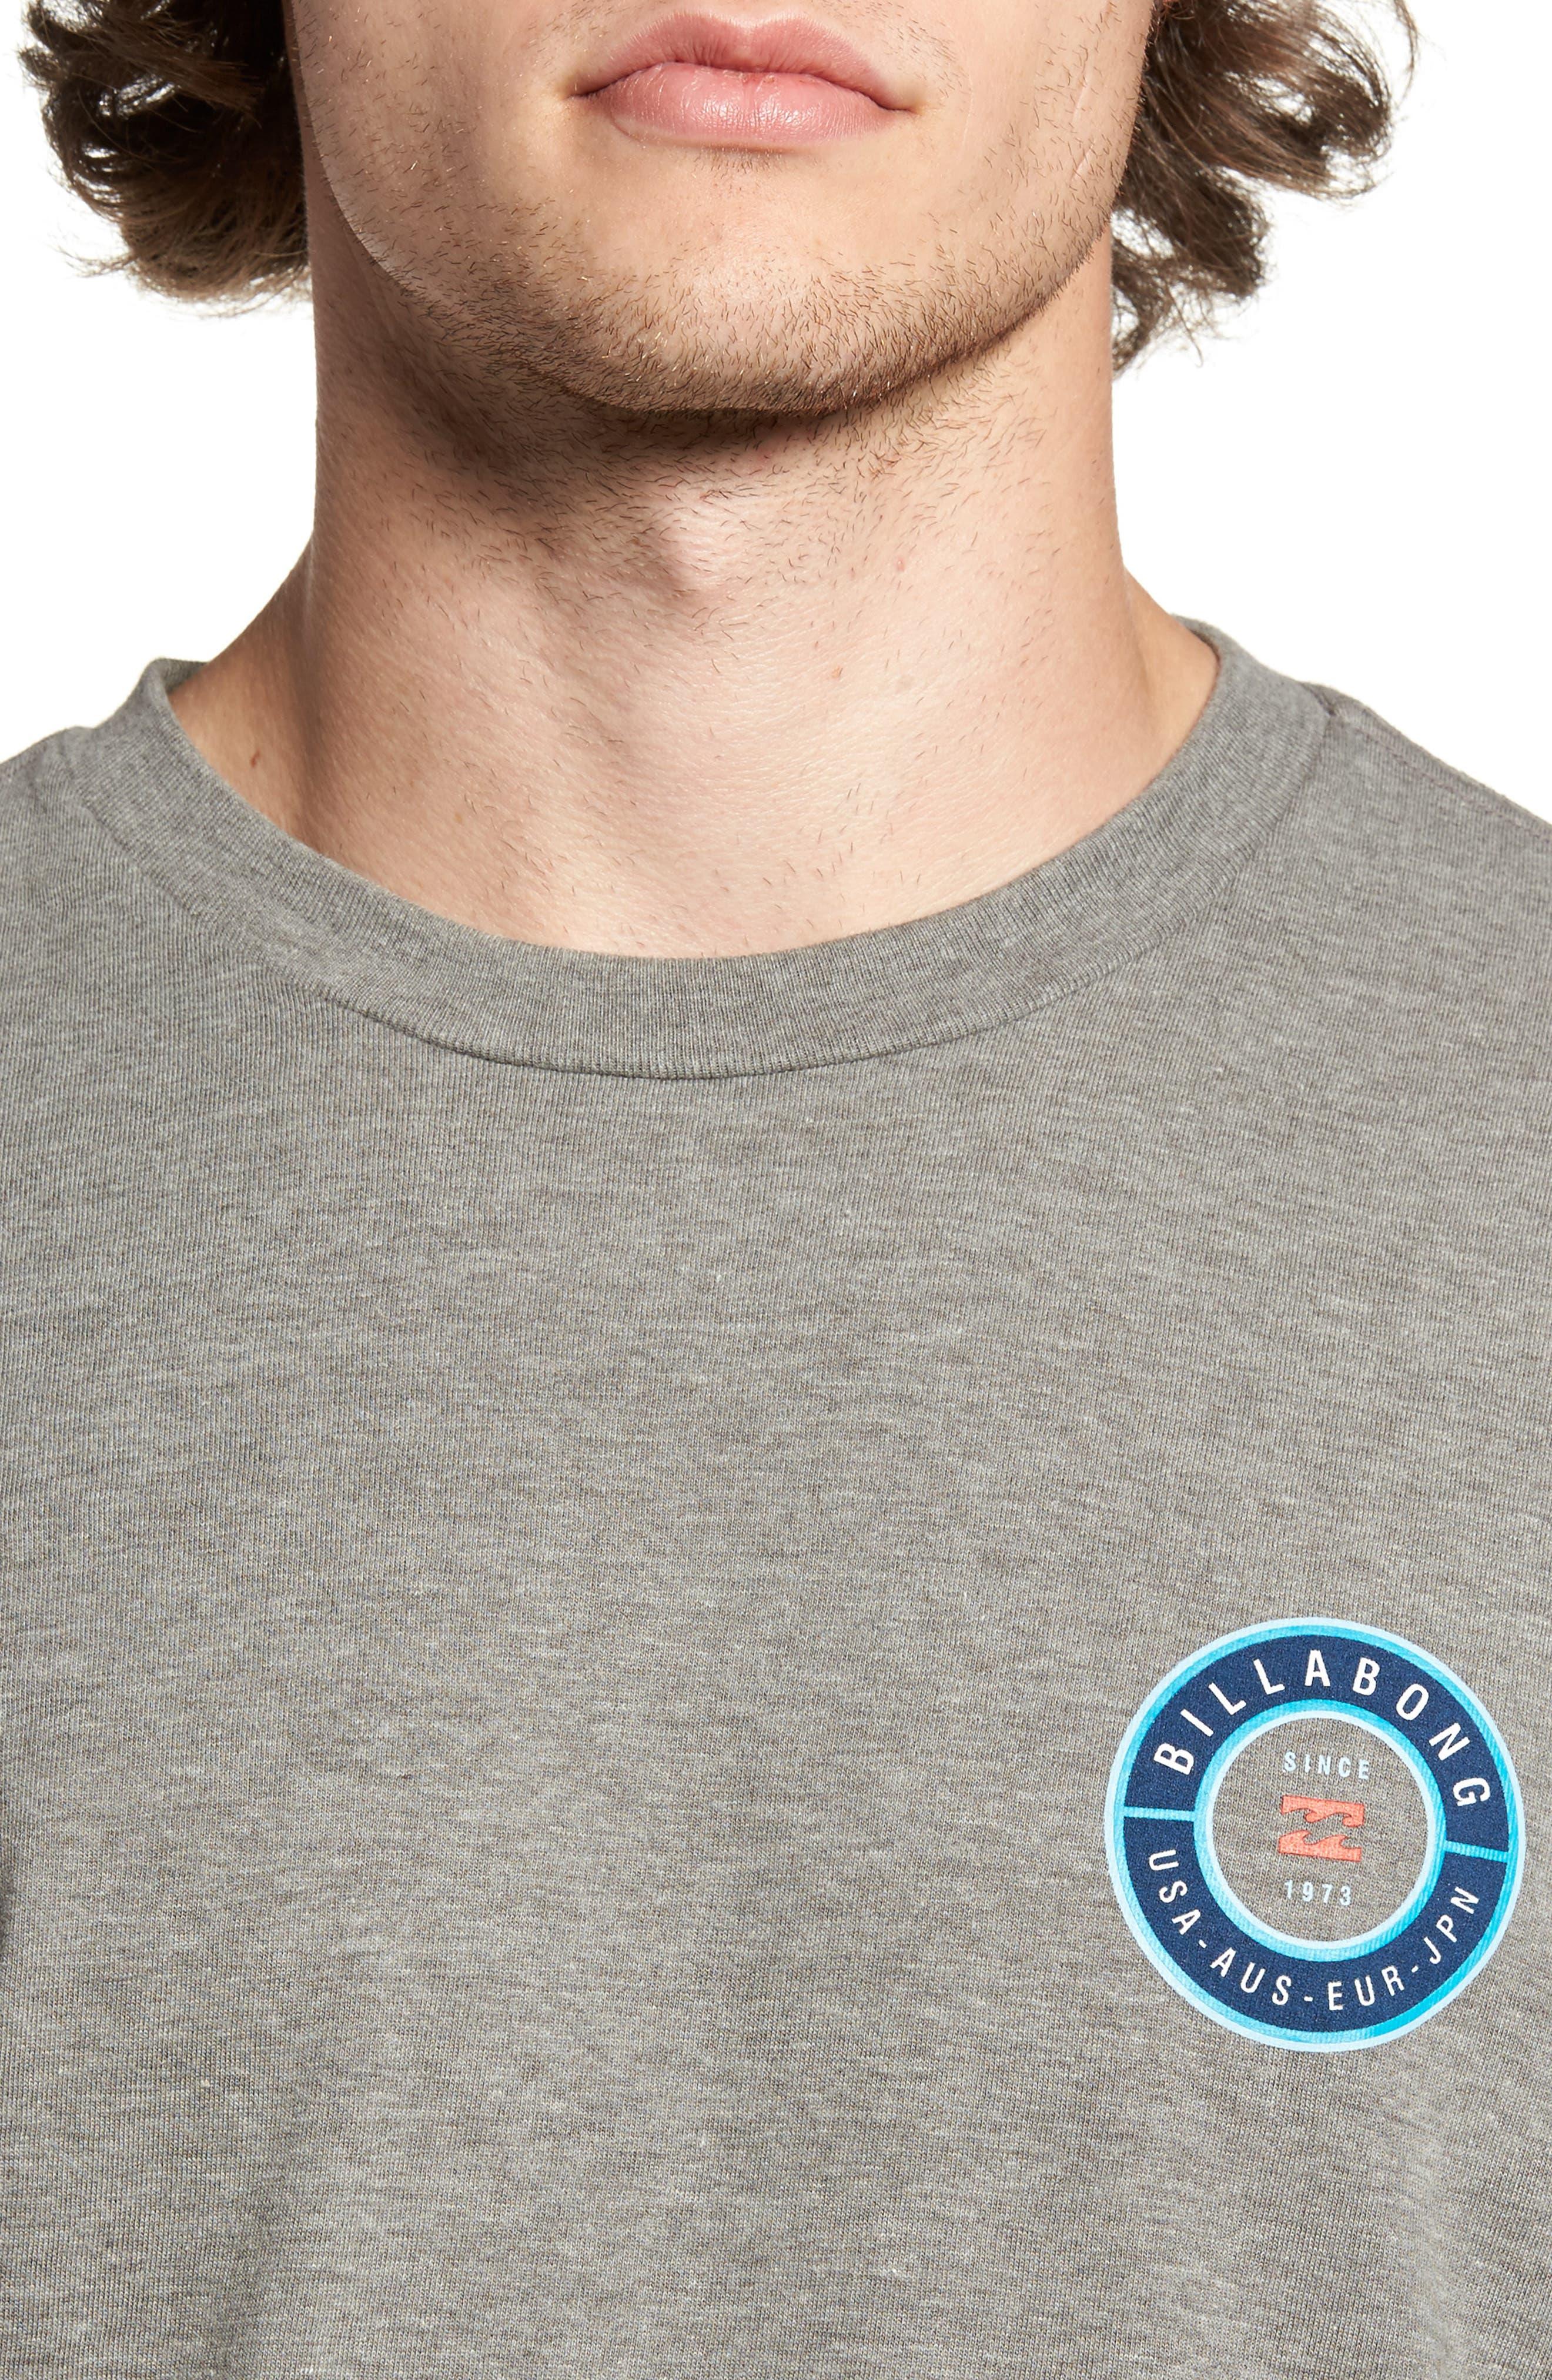 Rotor Graphic T-Shirt,                             Alternate thumbnail 4, color,                             025